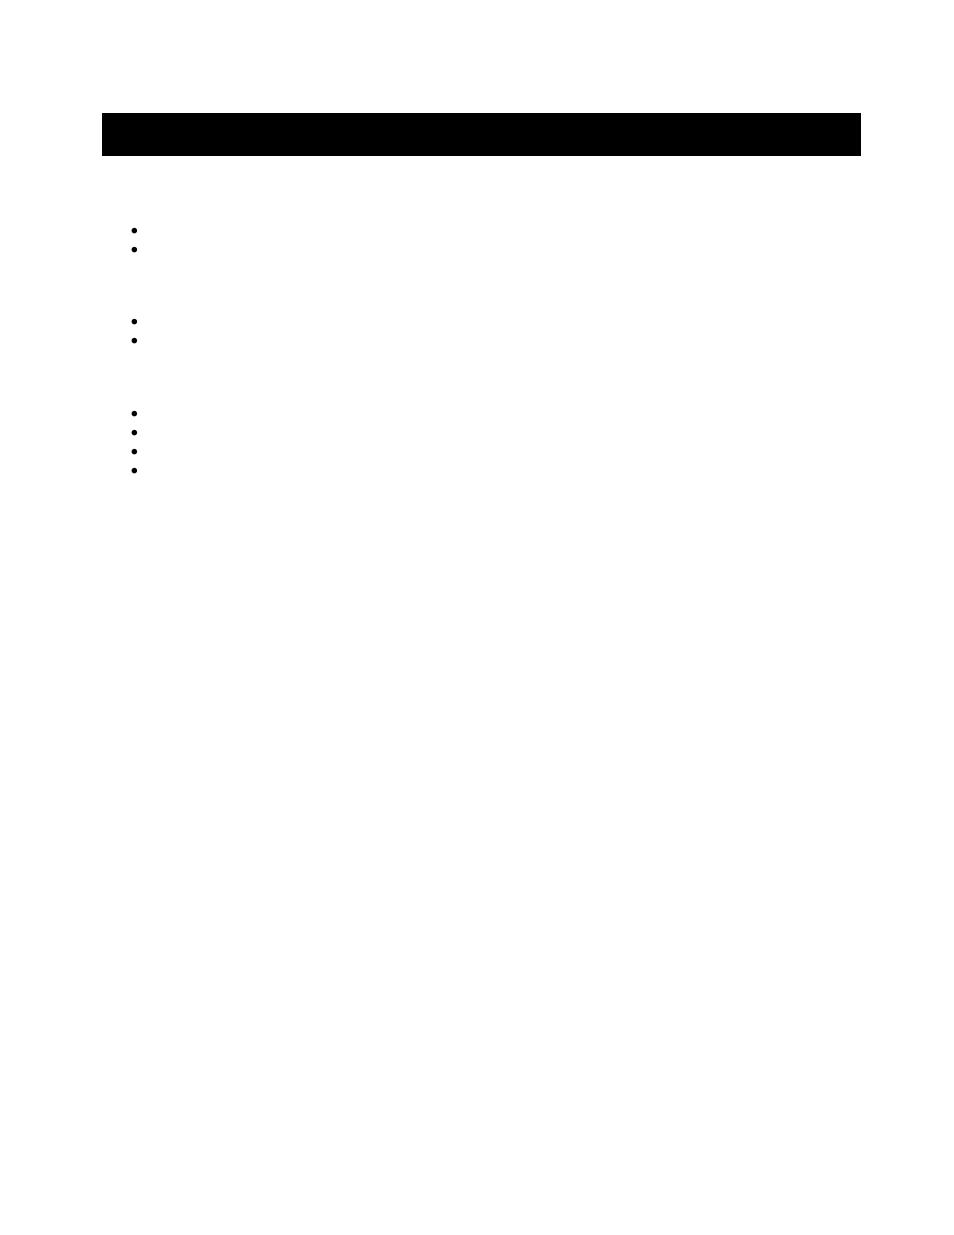 hight resolution of system orientation sky scan 2 0 omnisistem sky scan user manual page 3 11